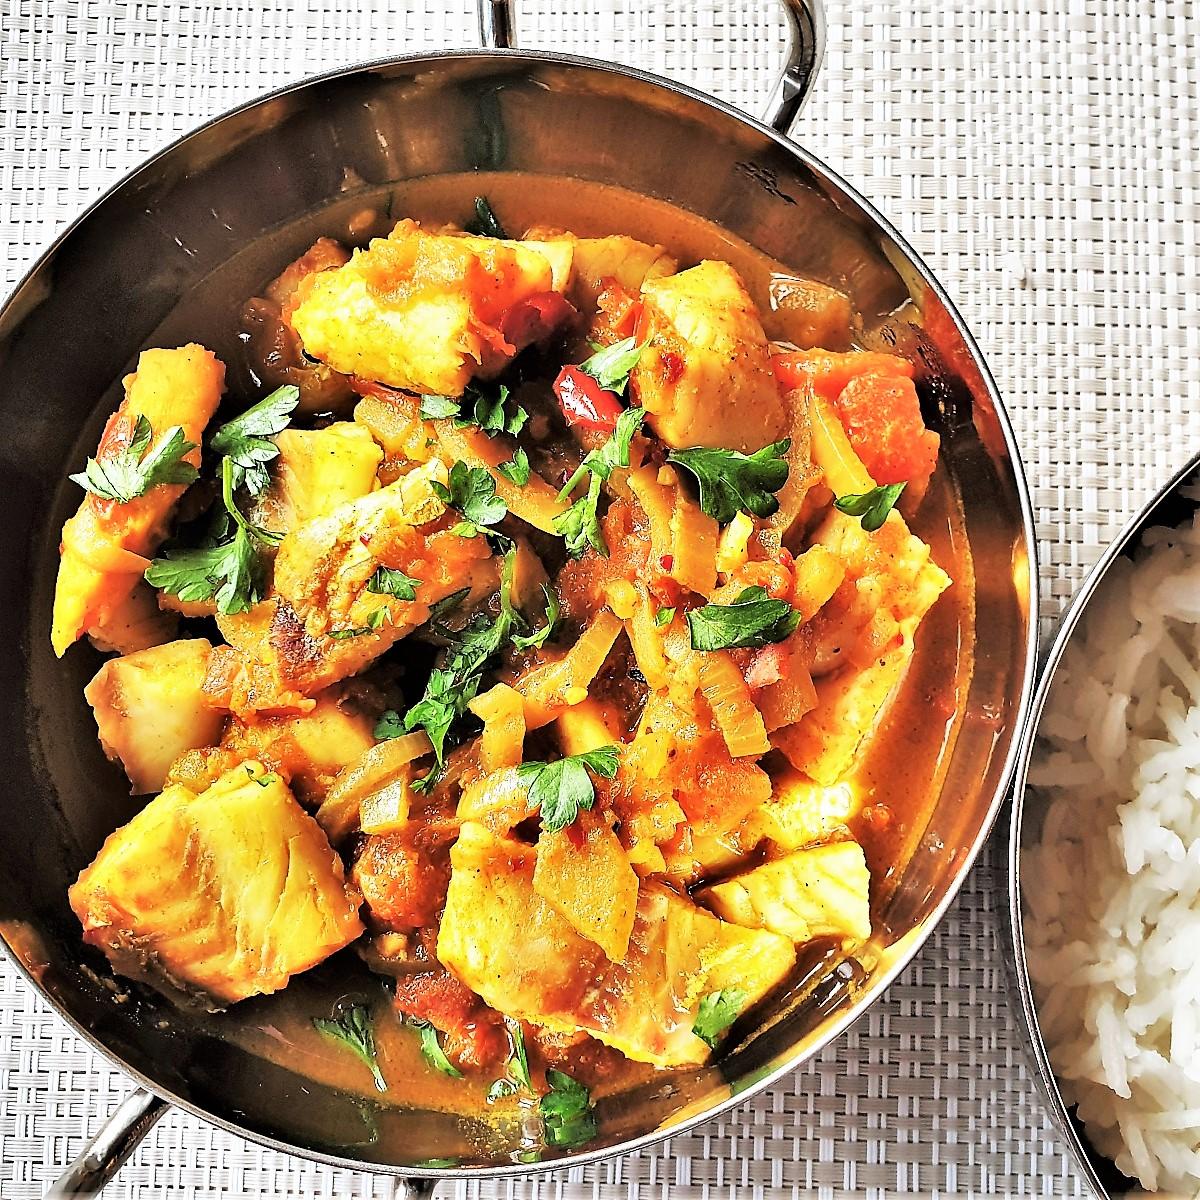 Fish curry in a balti dish.